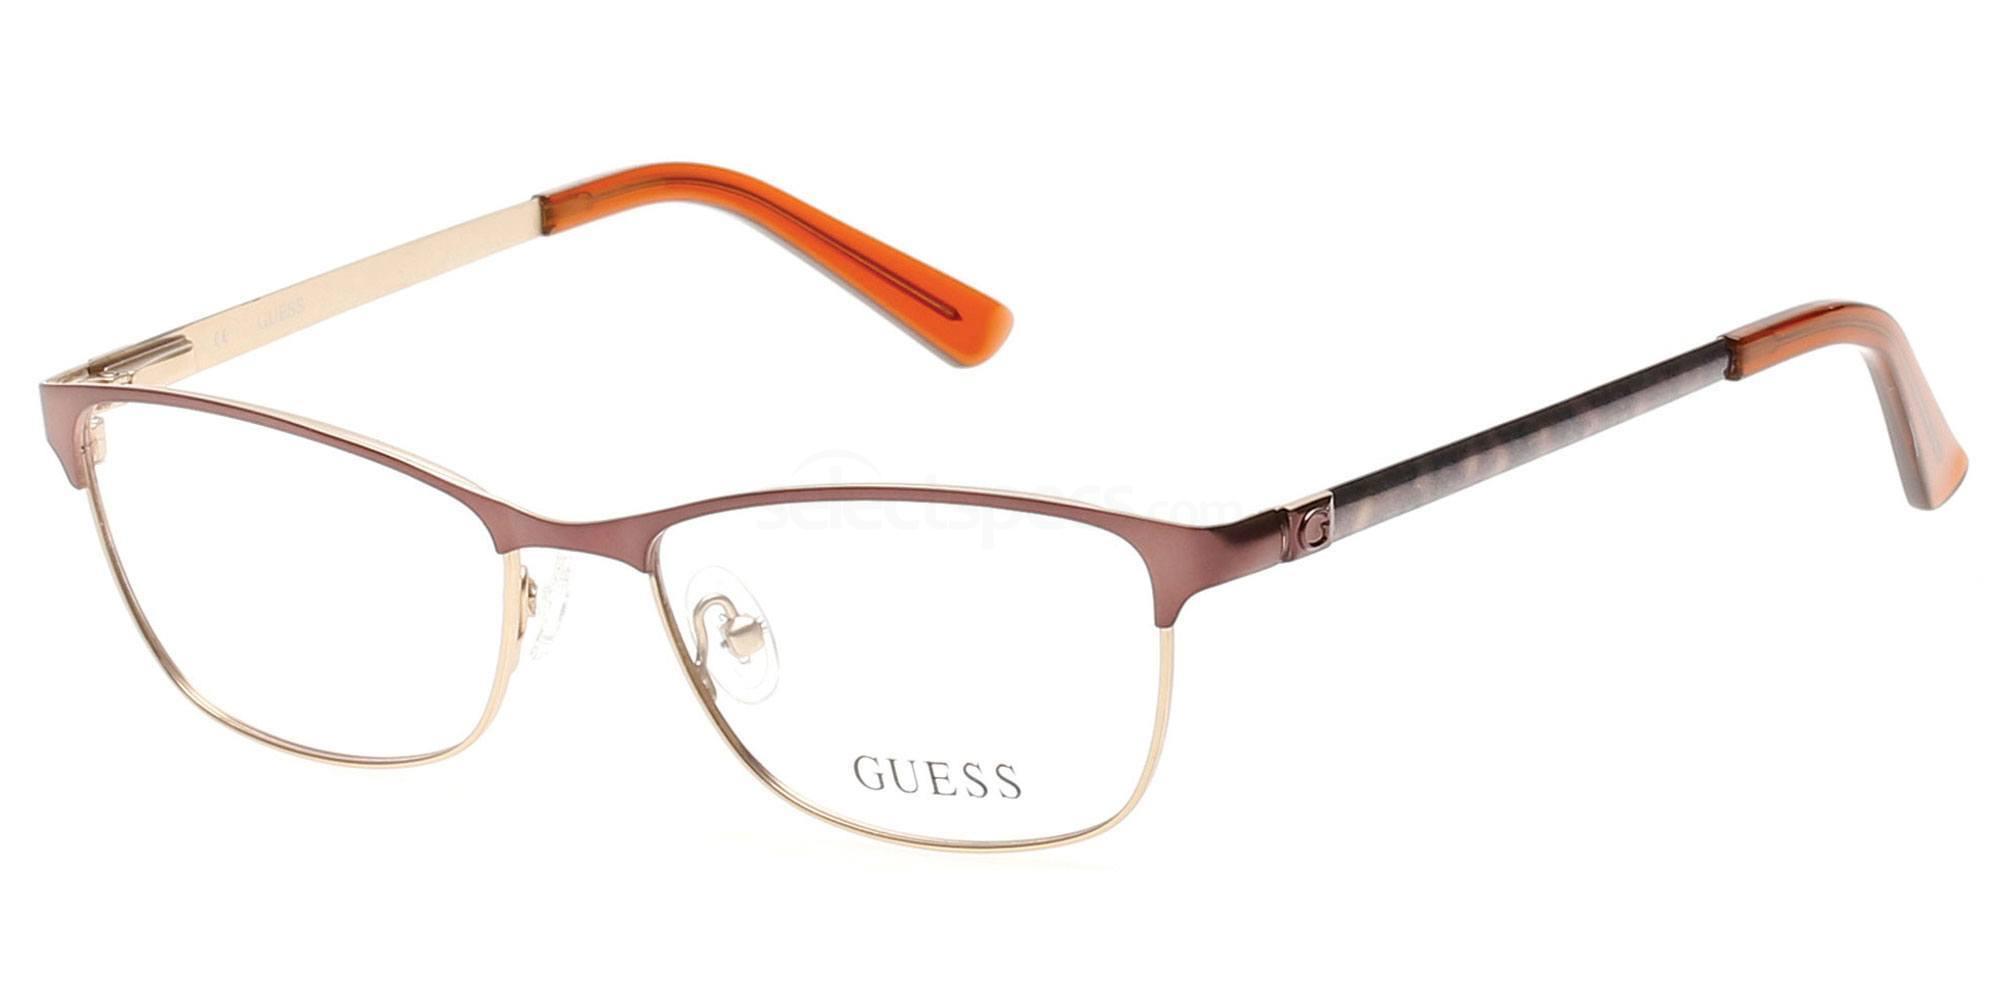 046 GU2512 Glasses, Guess